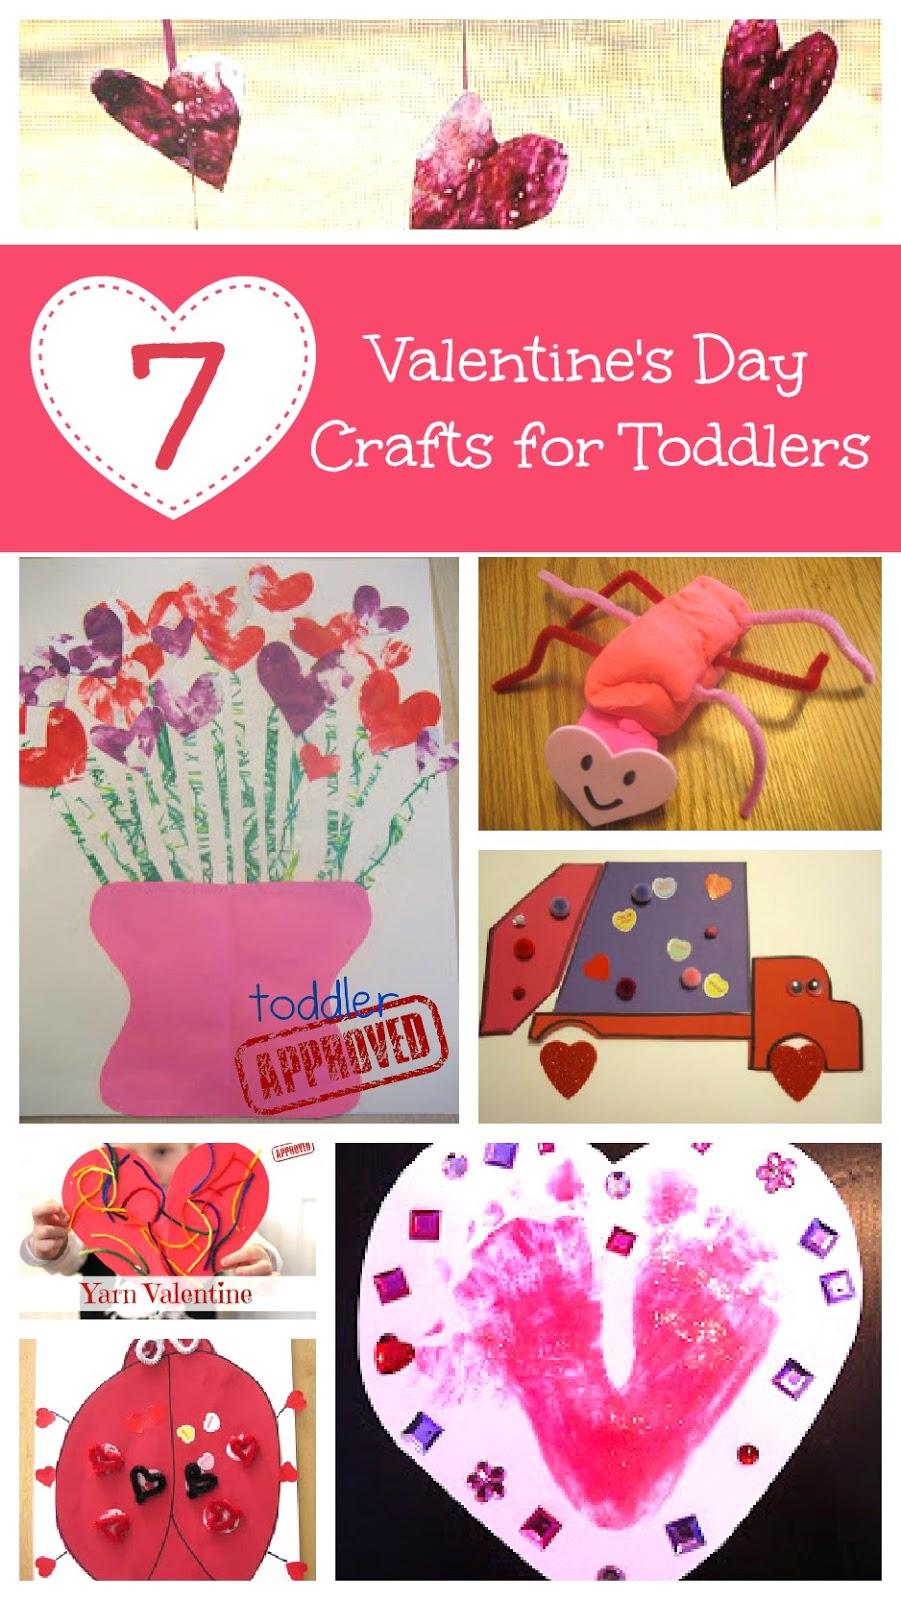 toddler approved 7 valentine 39 s day crafts for toddlers. Black Bedroom Furniture Sets. Home Design Ideas